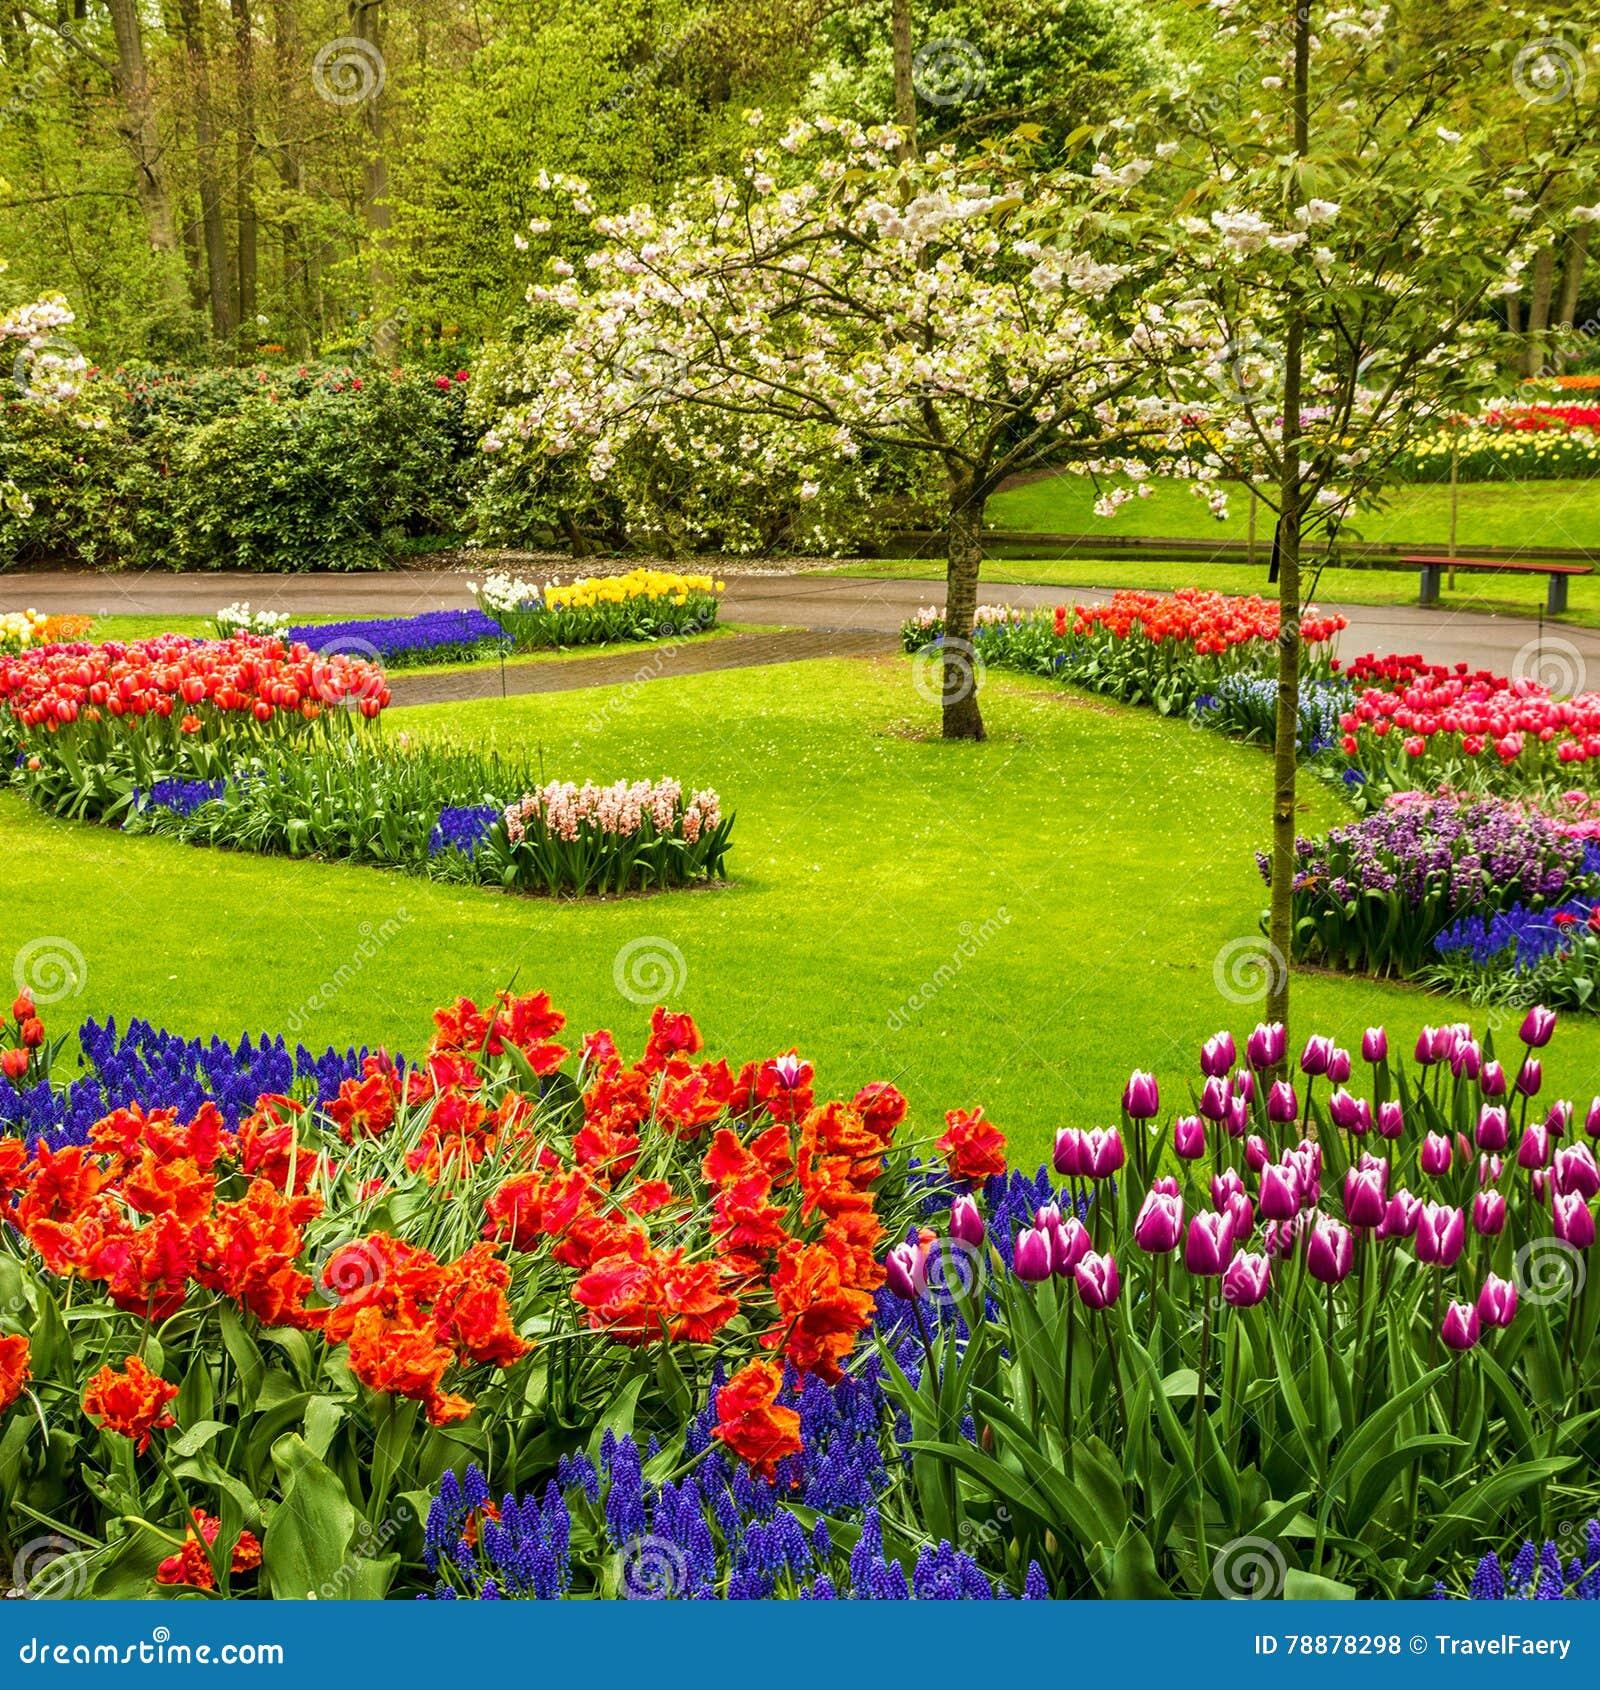 Jardines de flores top jardines de flores with jardines for Parques con jardines